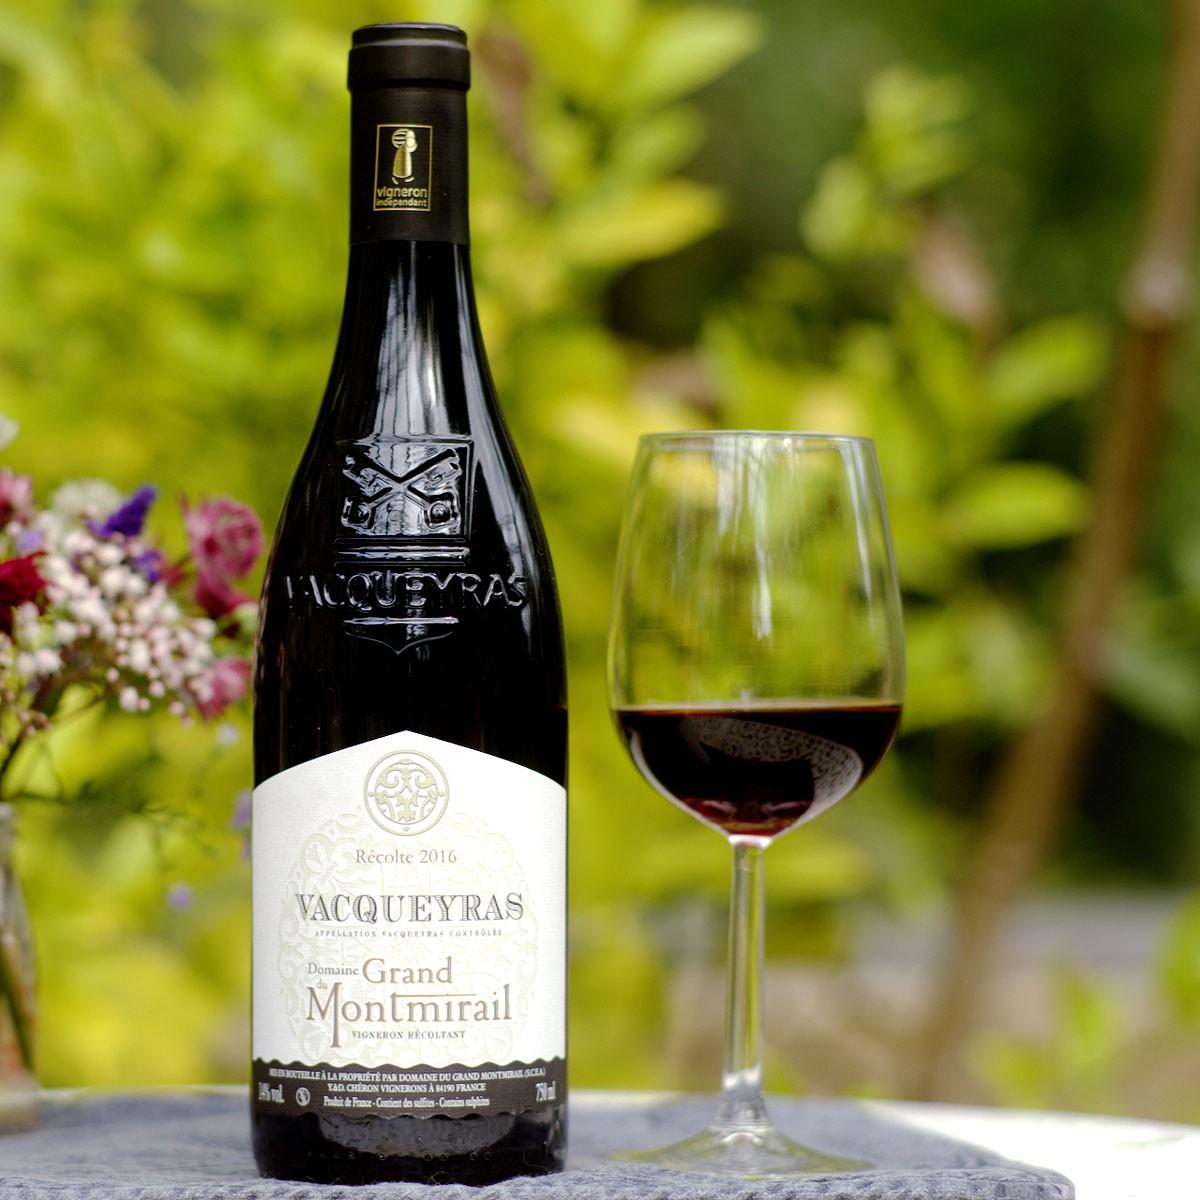 Vacqueyras: Domaine du Grand Montmirail 2016 - Lifestyle